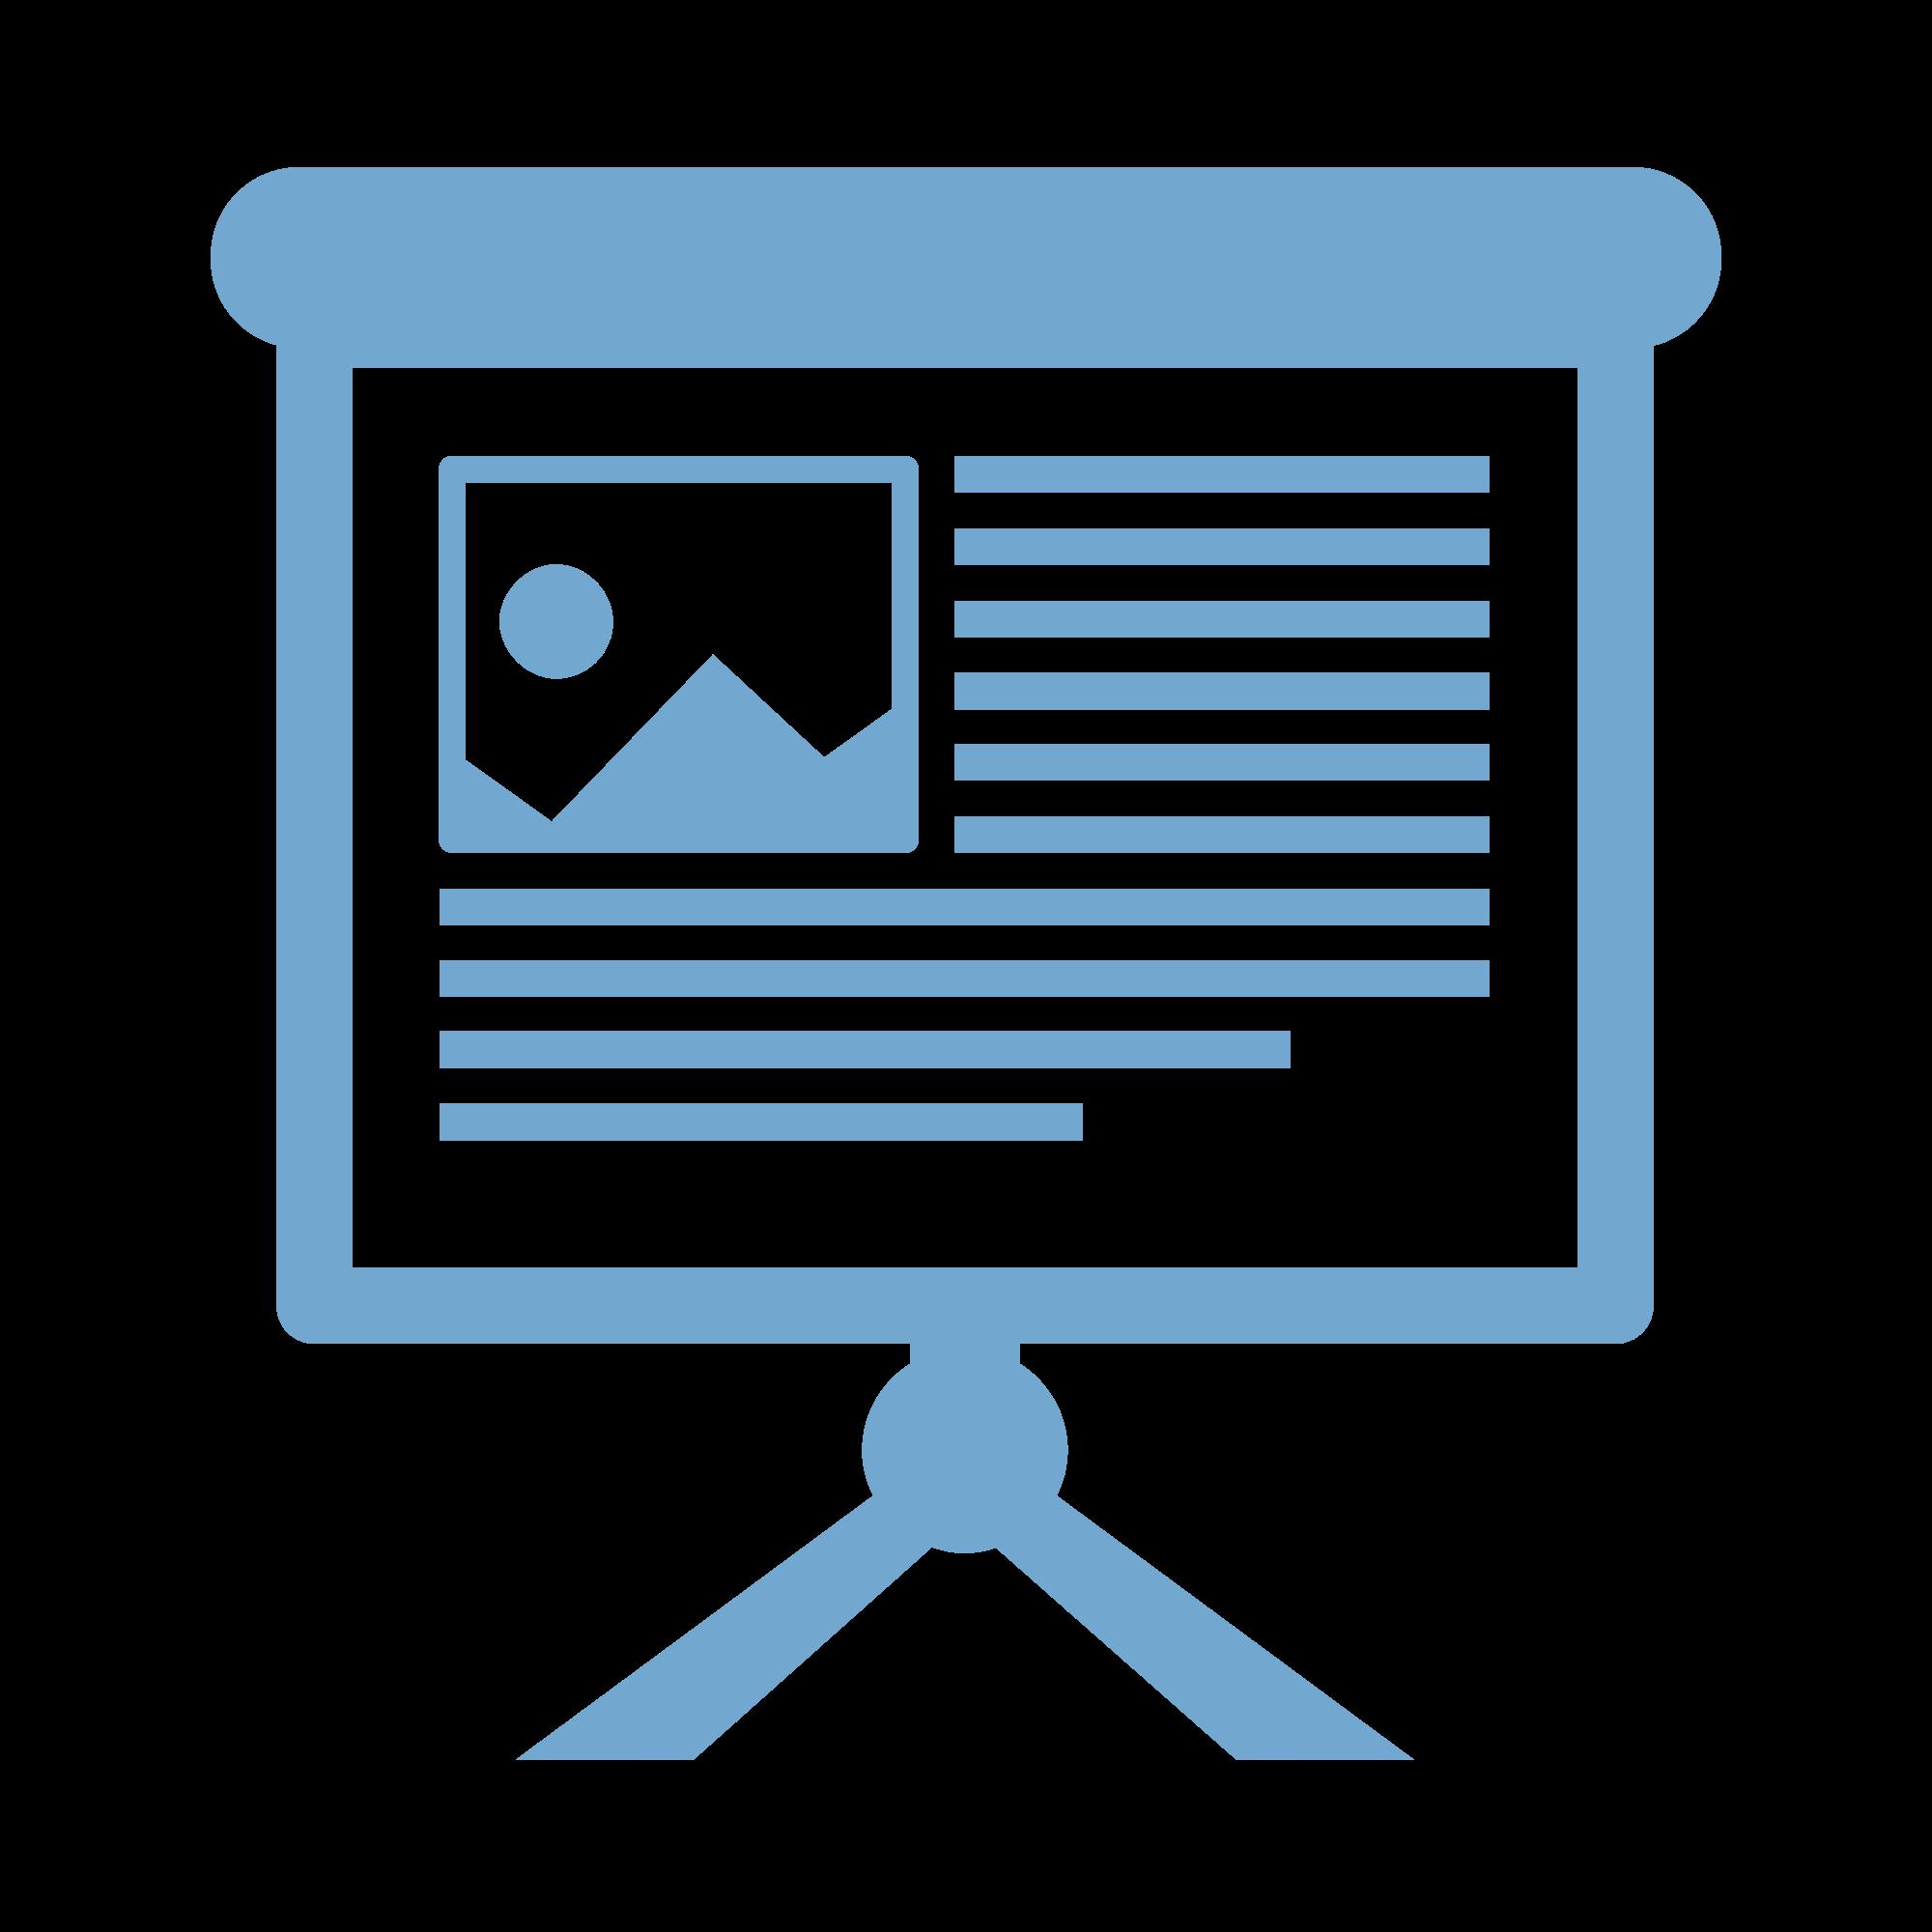 a Presentation icon